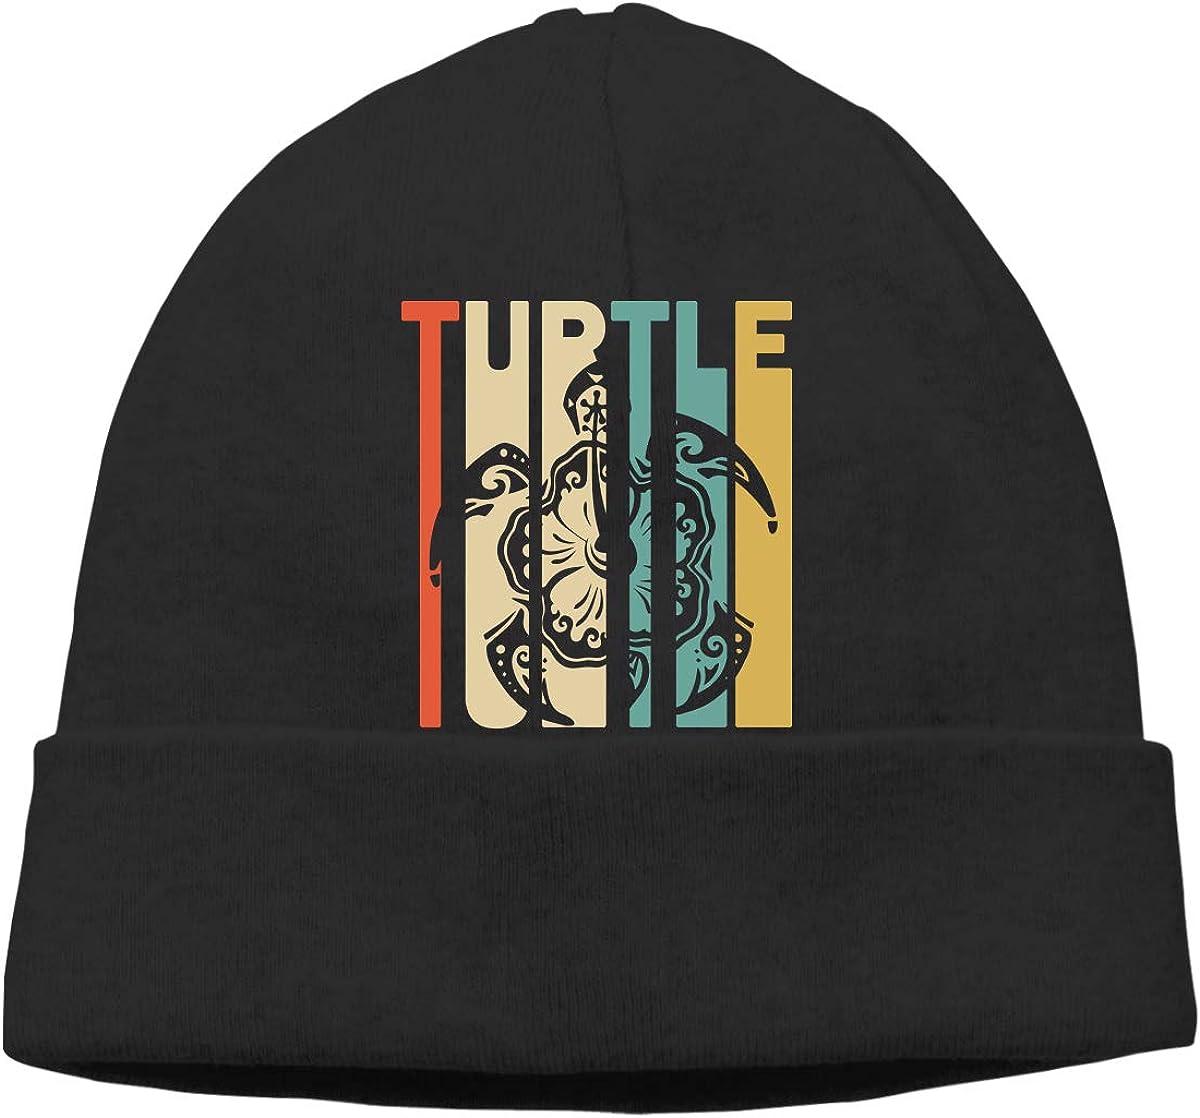 Retro Style Turtle Silhouette-2 Unisex Knitting Wool Warm Cycling Beanie Cap